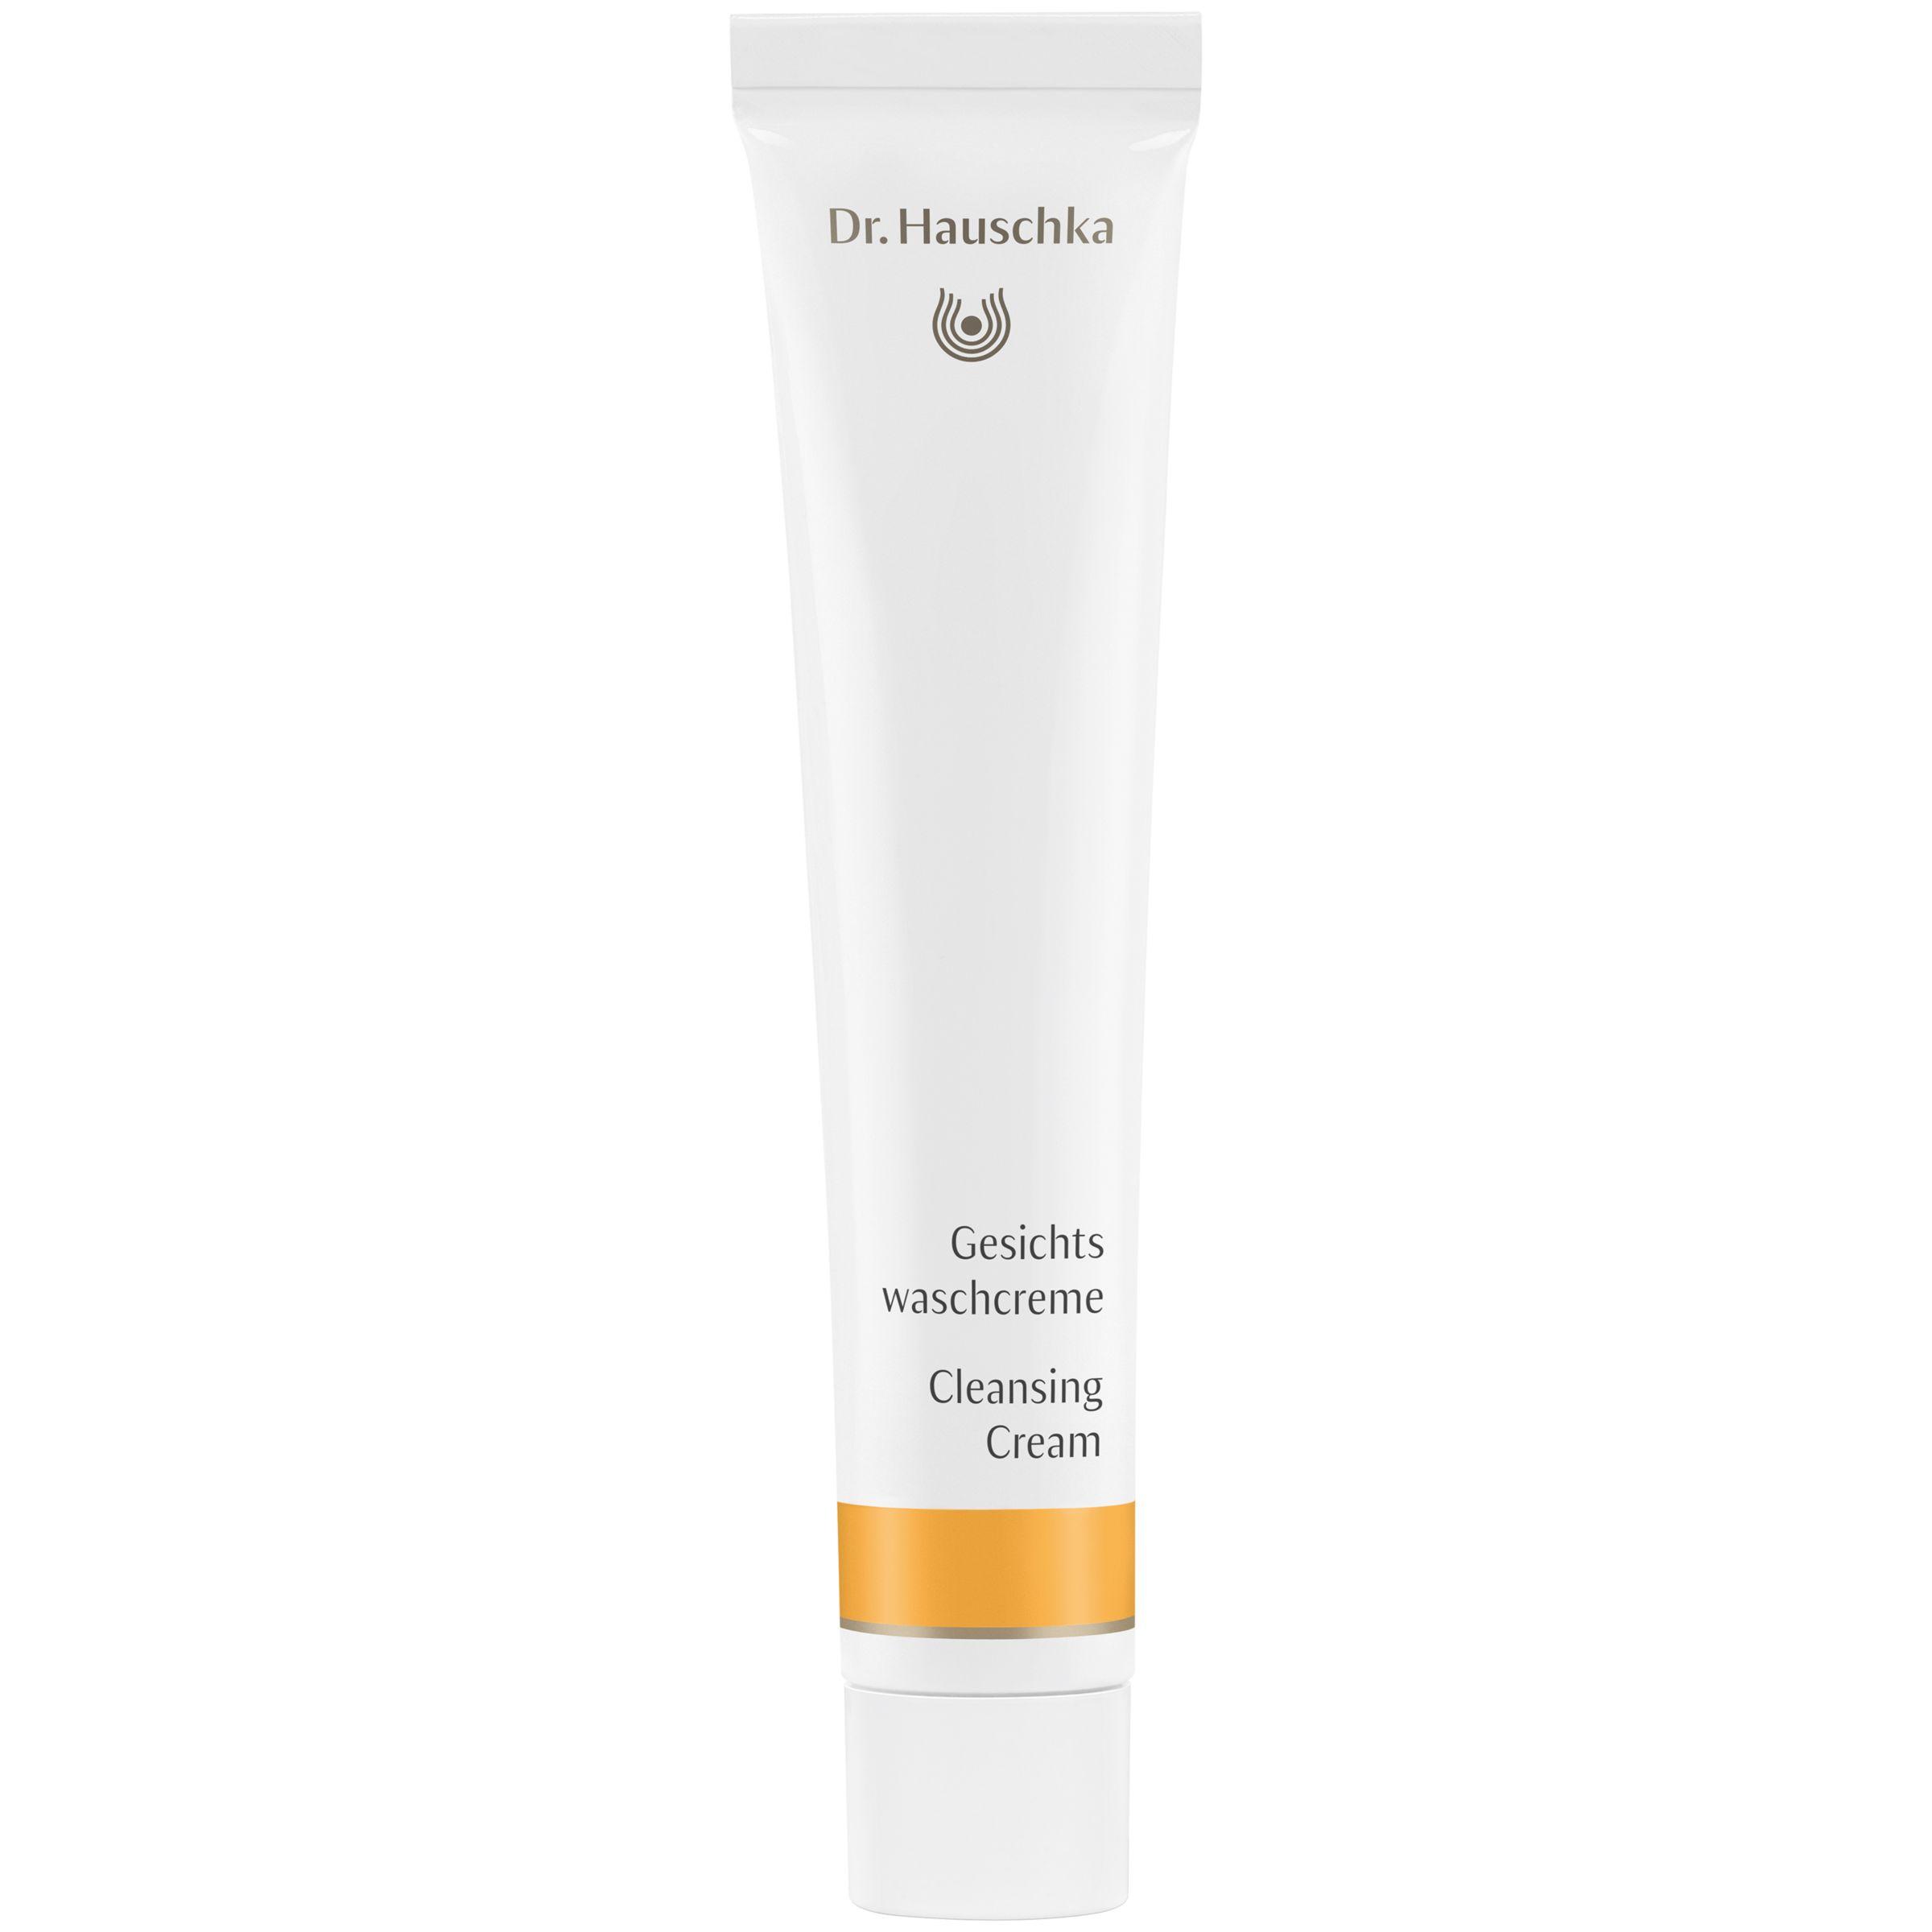 Dr Hauschka Dr Hauschka Cleansing Cream, 50ml